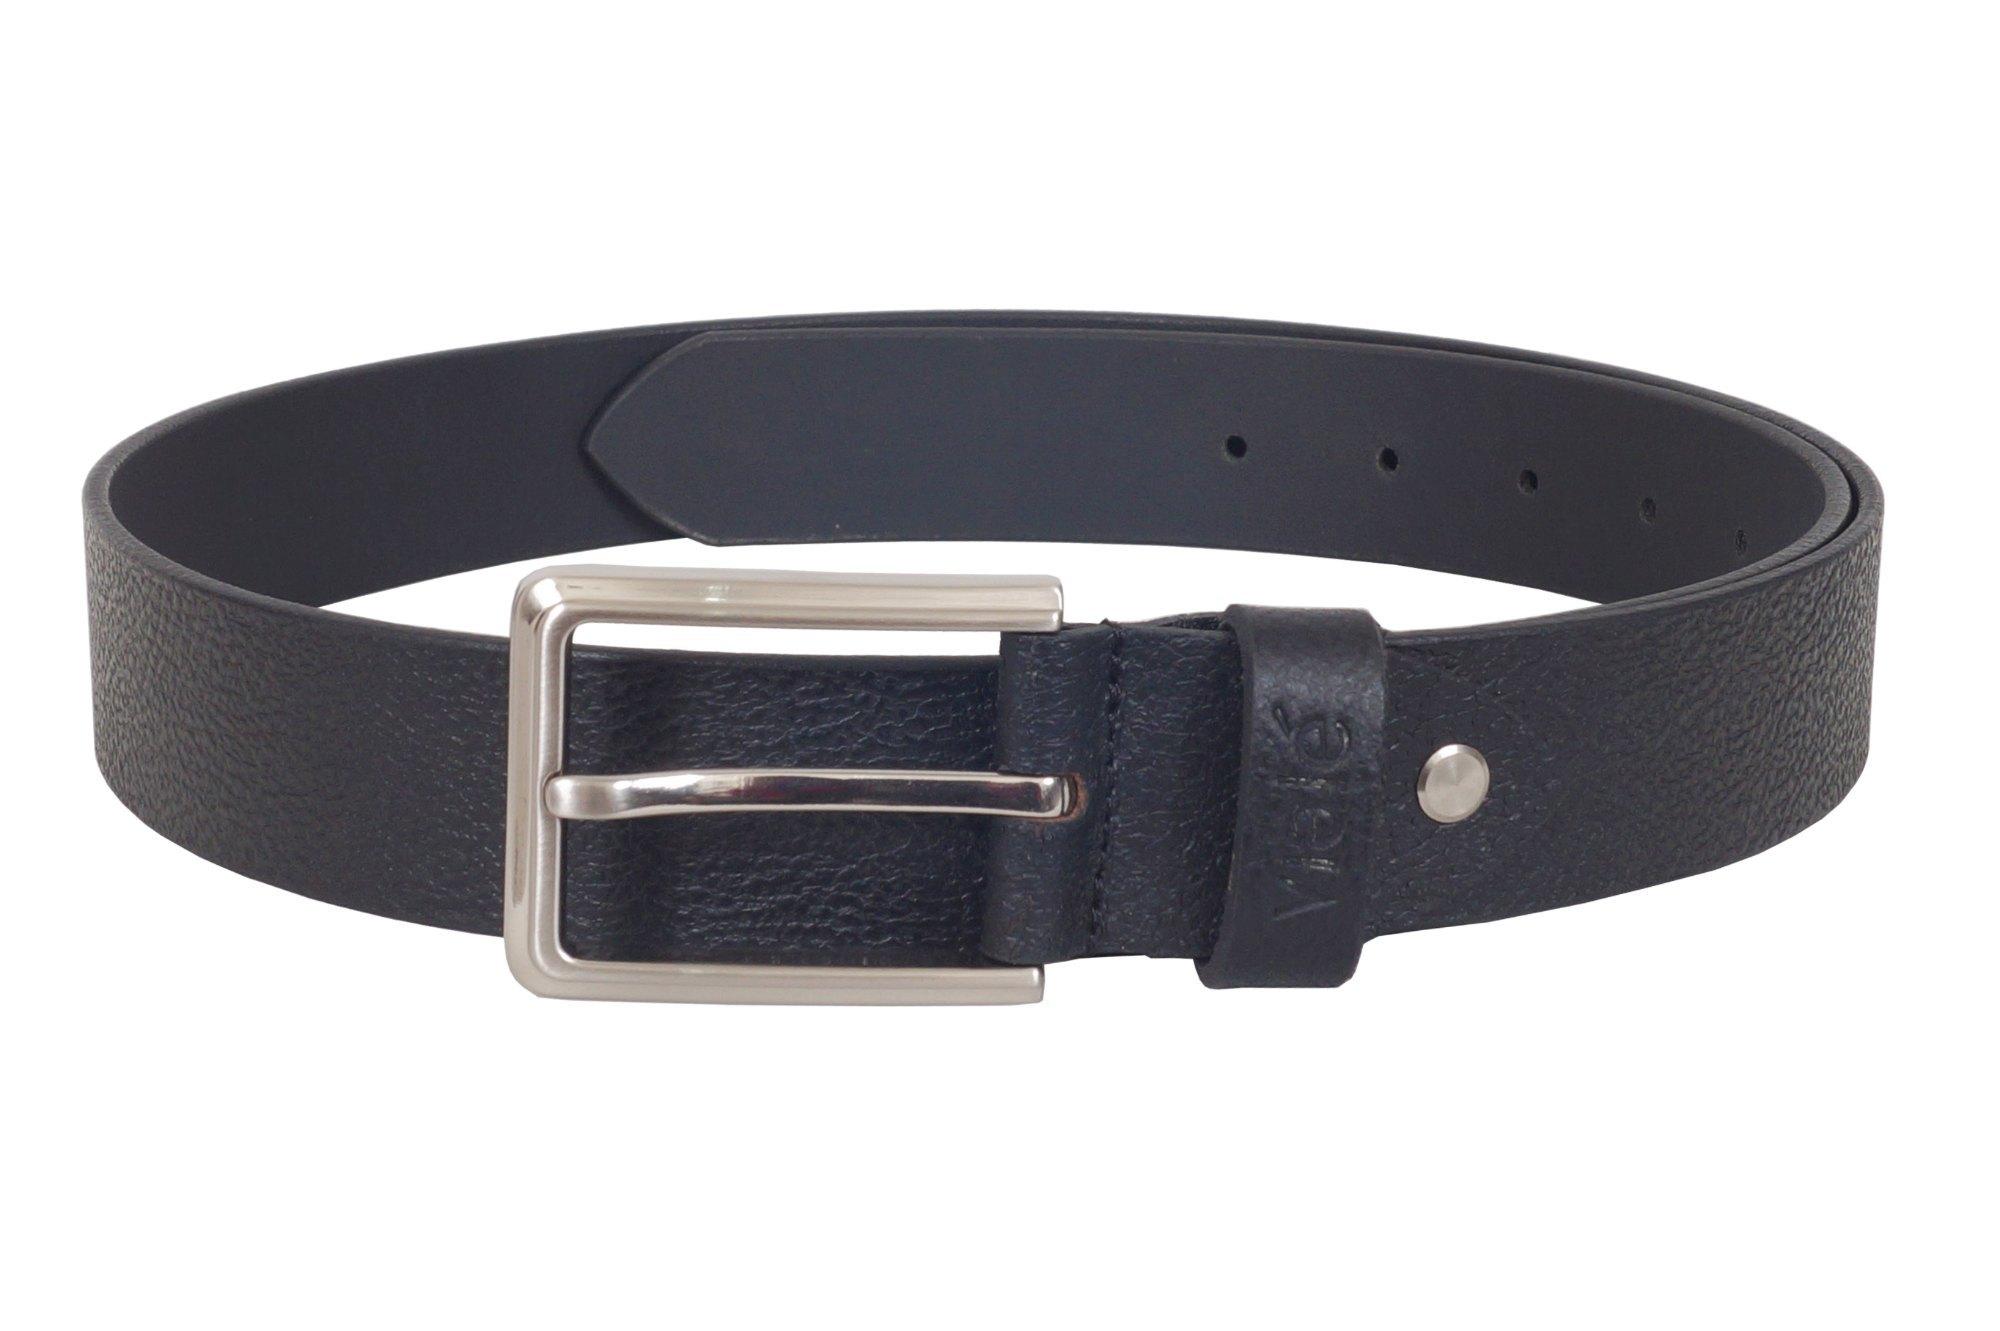 MenS Nener Casual Belt Buckle Metal Pin Leather Modern